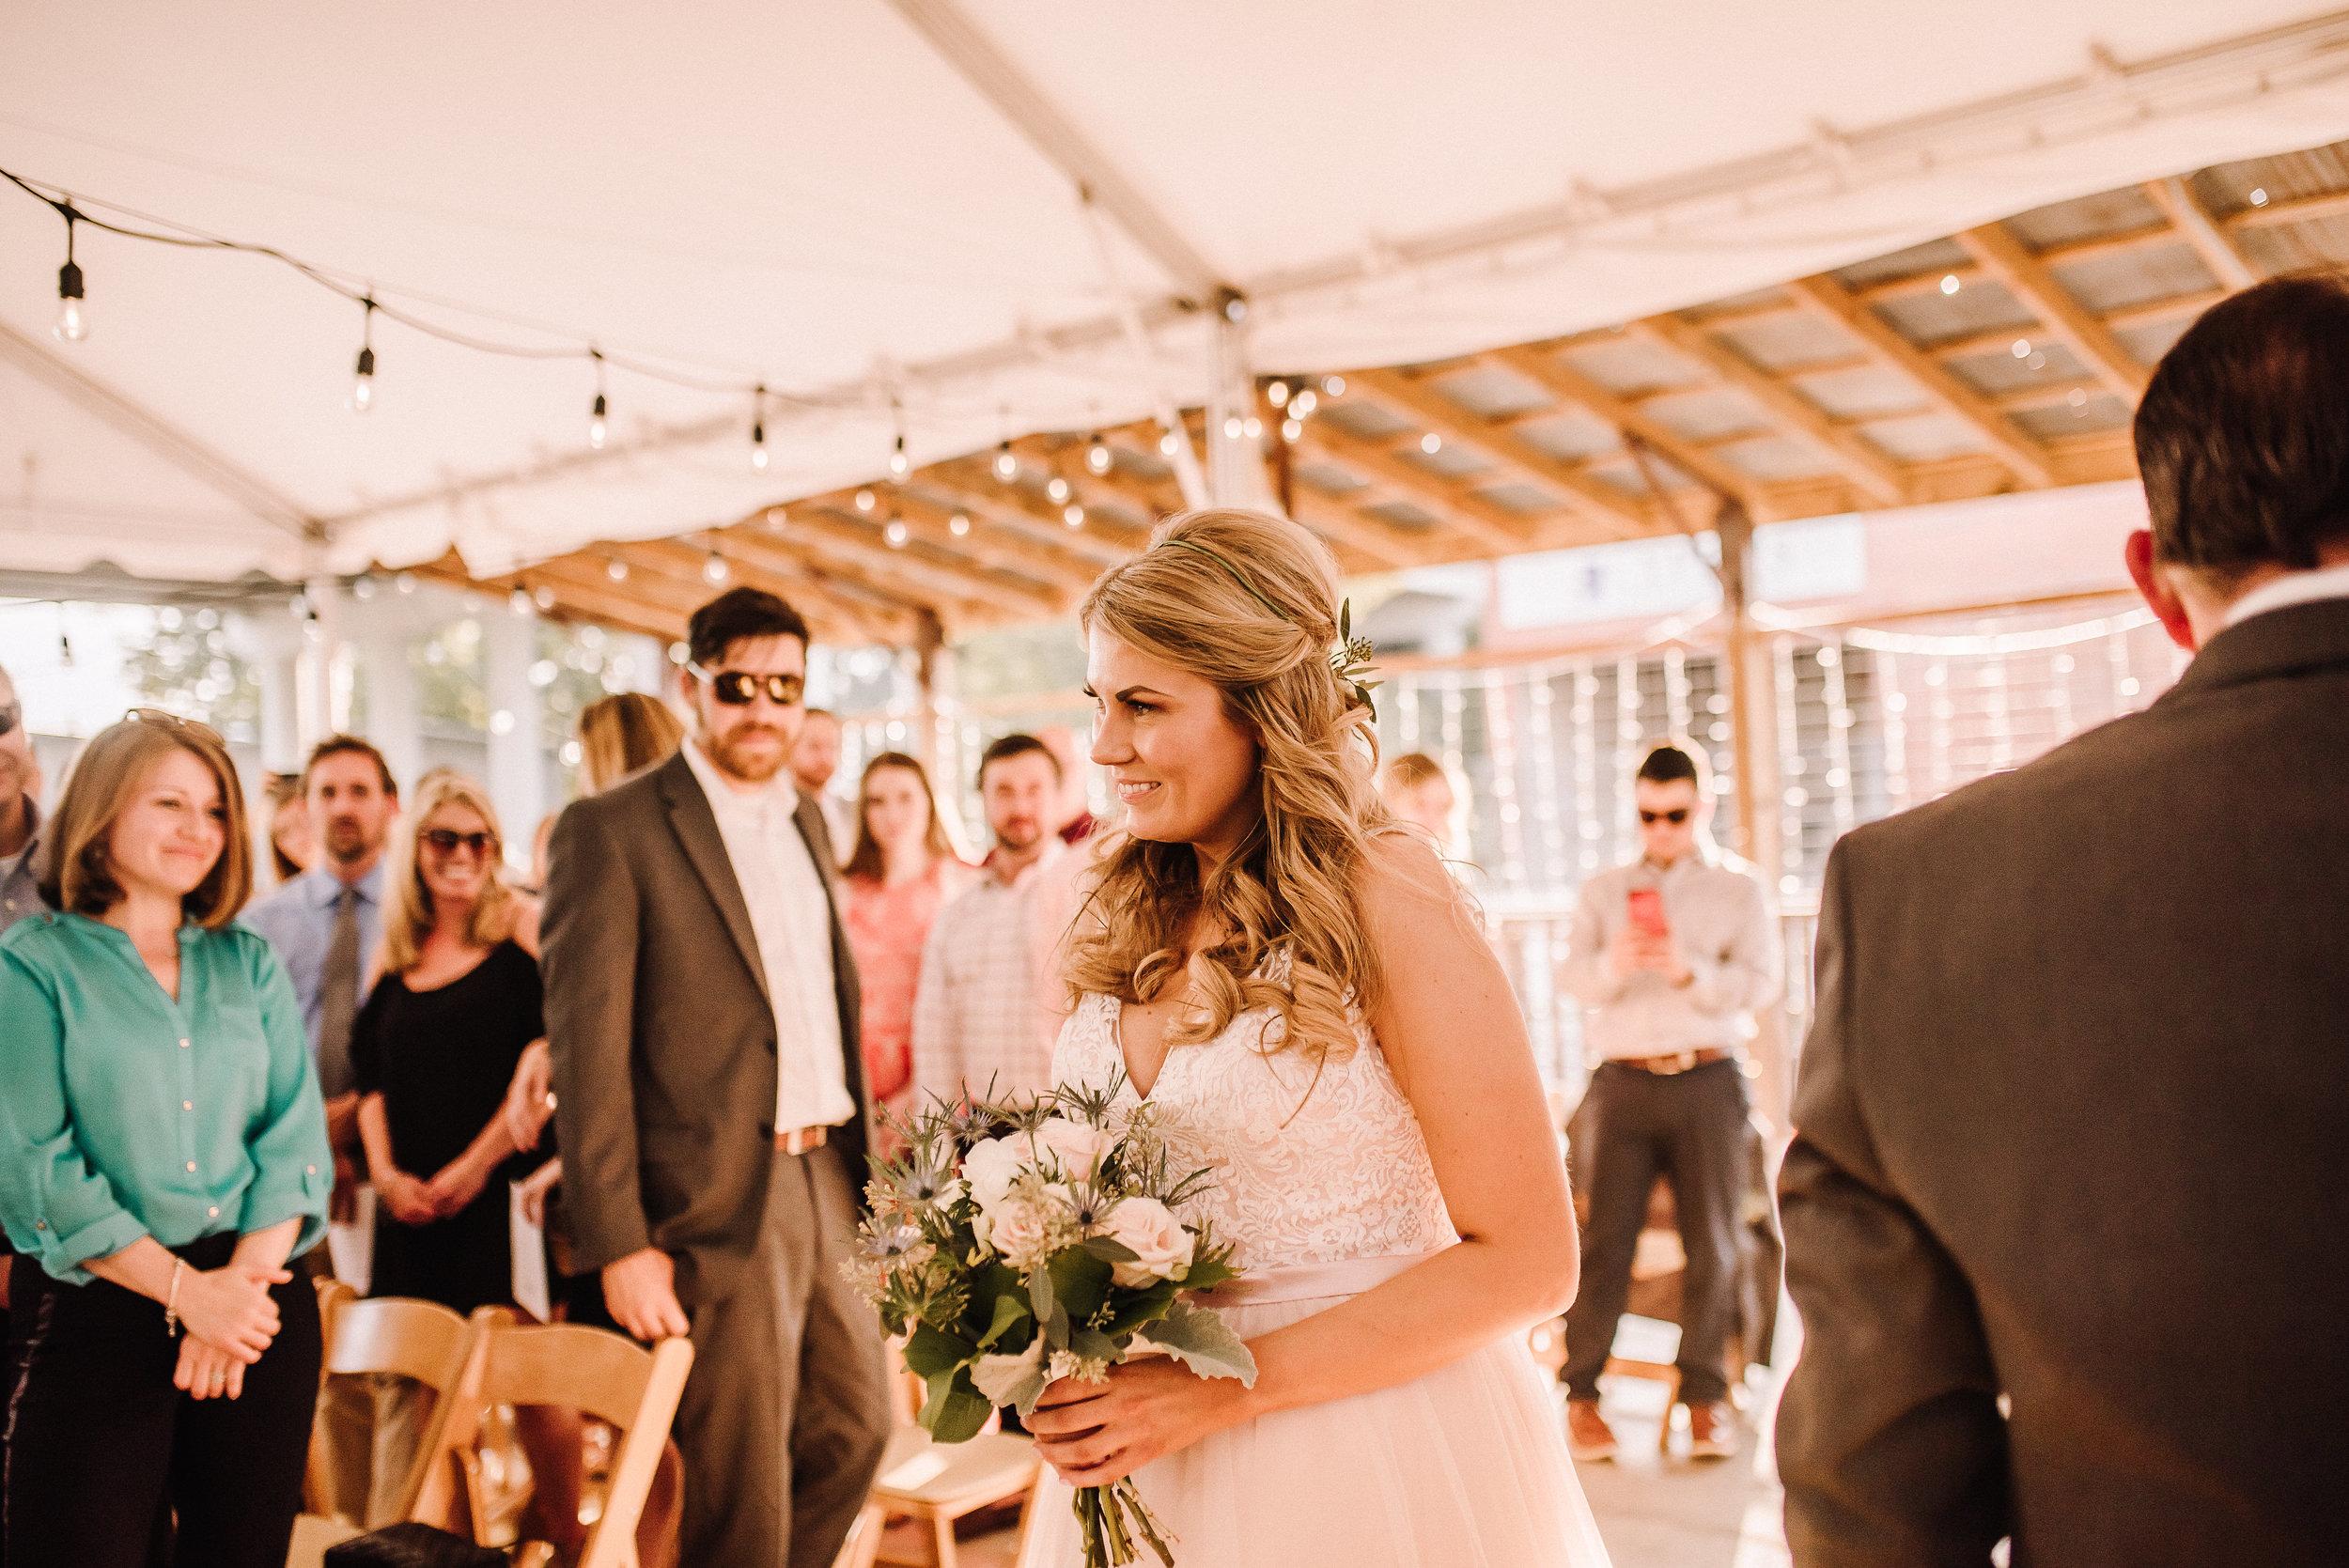 Pearson-Wiseacre-Wedding_Ashley-Benham-Photography (189 of 633).jpg